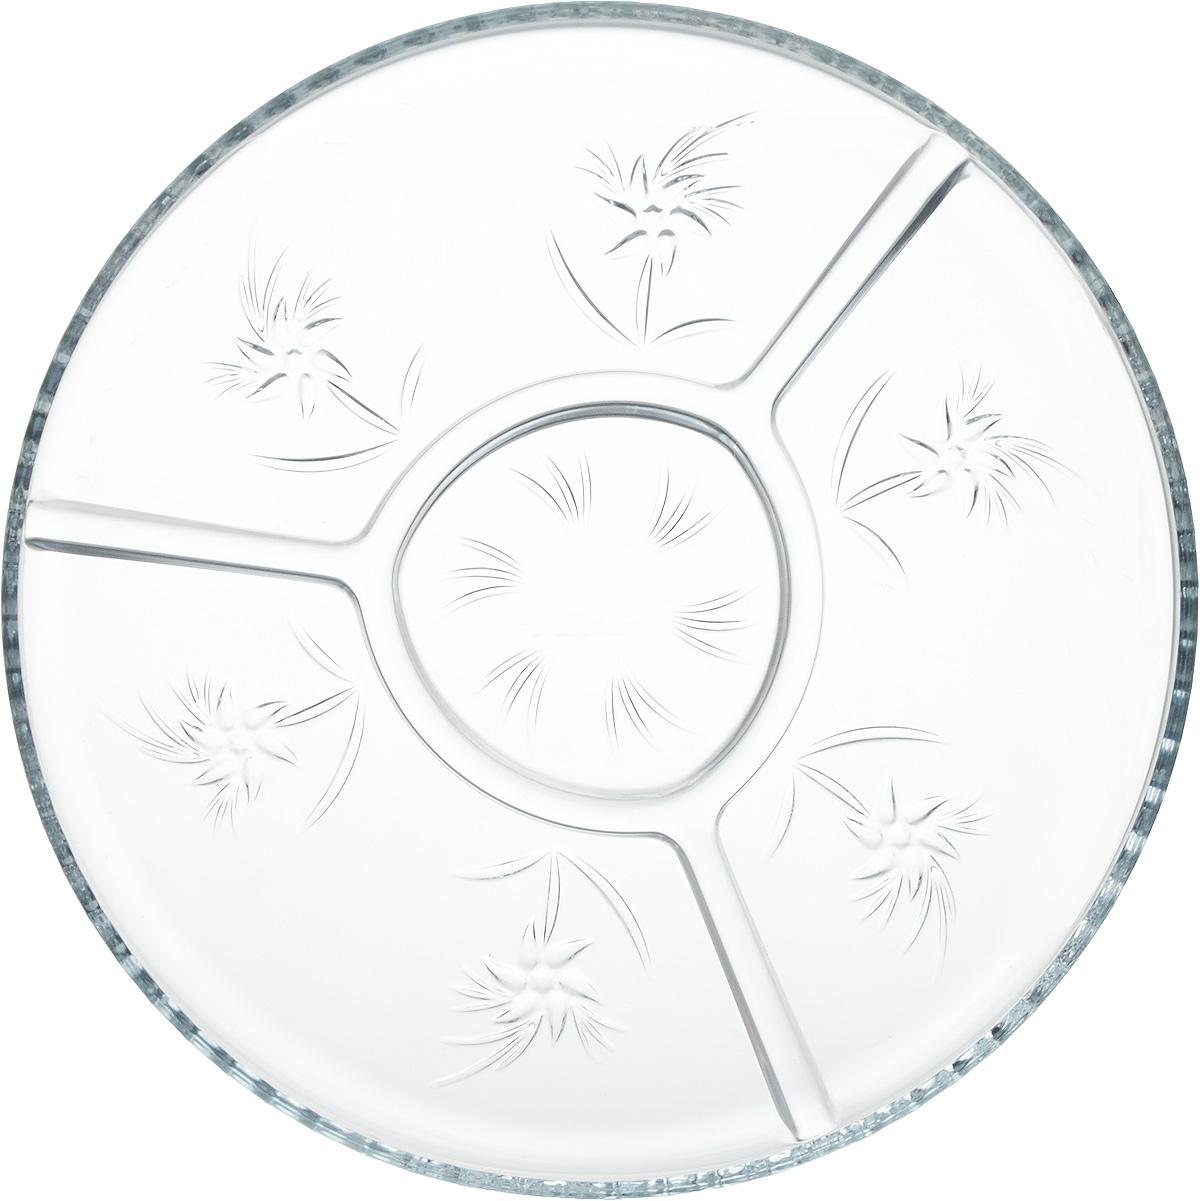 Блюдо Isfahan Simin, диаметр 27 см салатник isfahan karen диаметр 29см